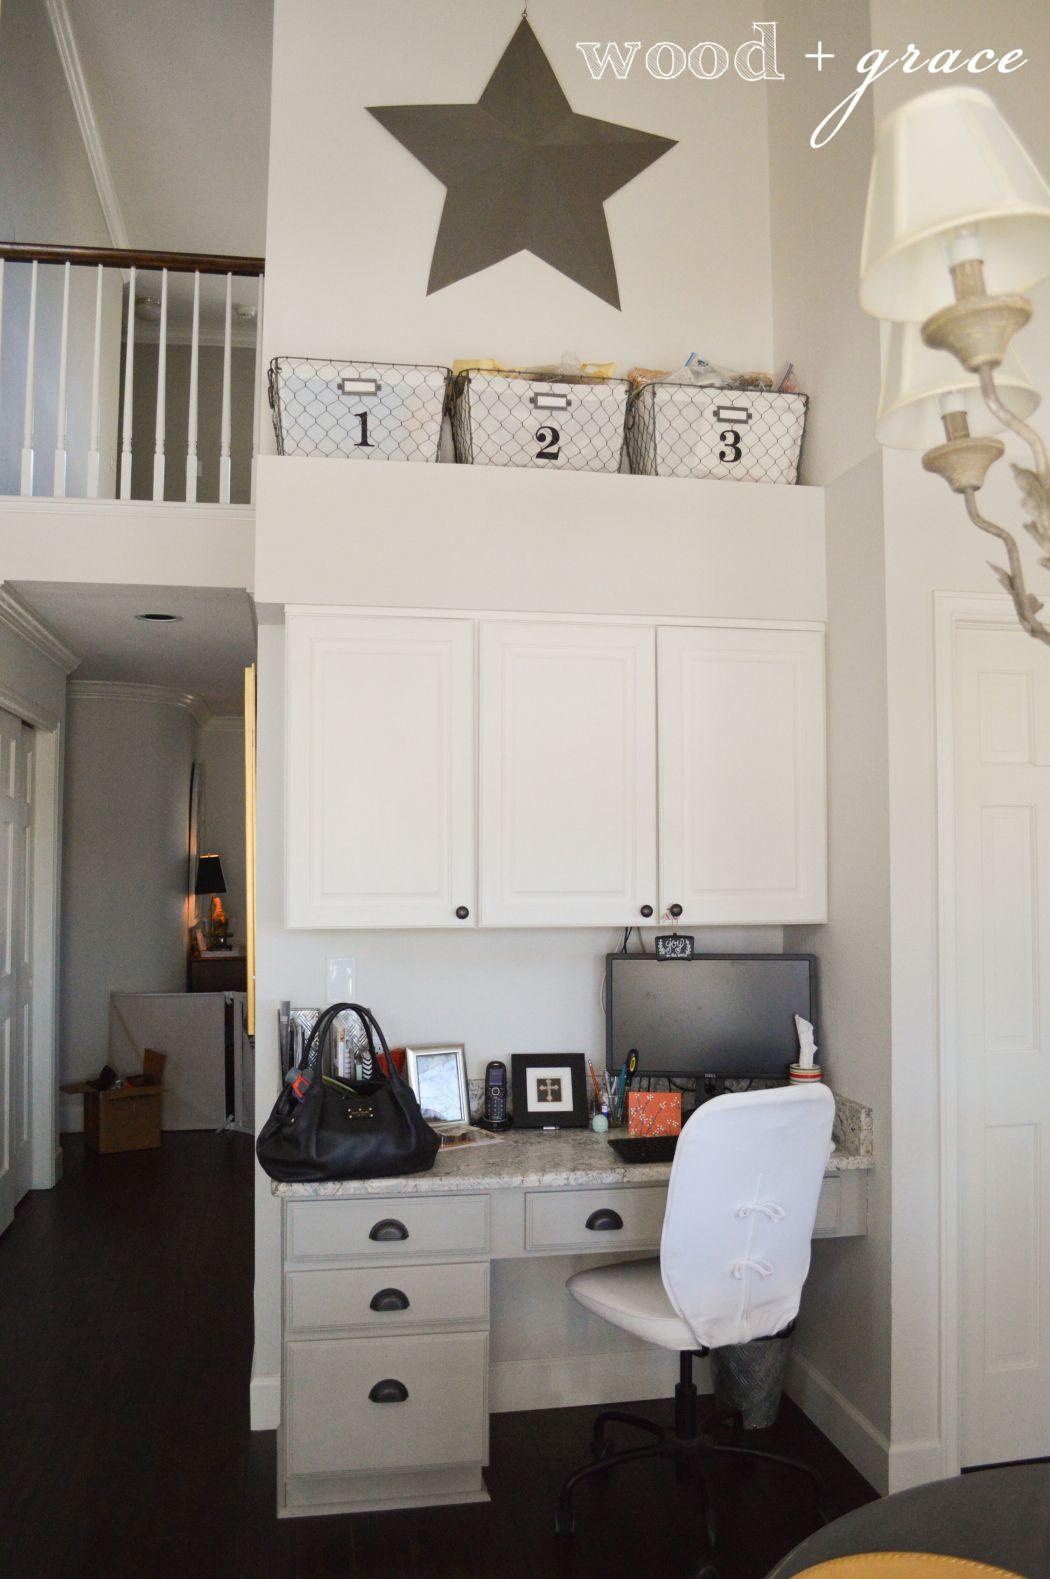 kitchen White refrigerator, Black dishwasher, Wood laminate